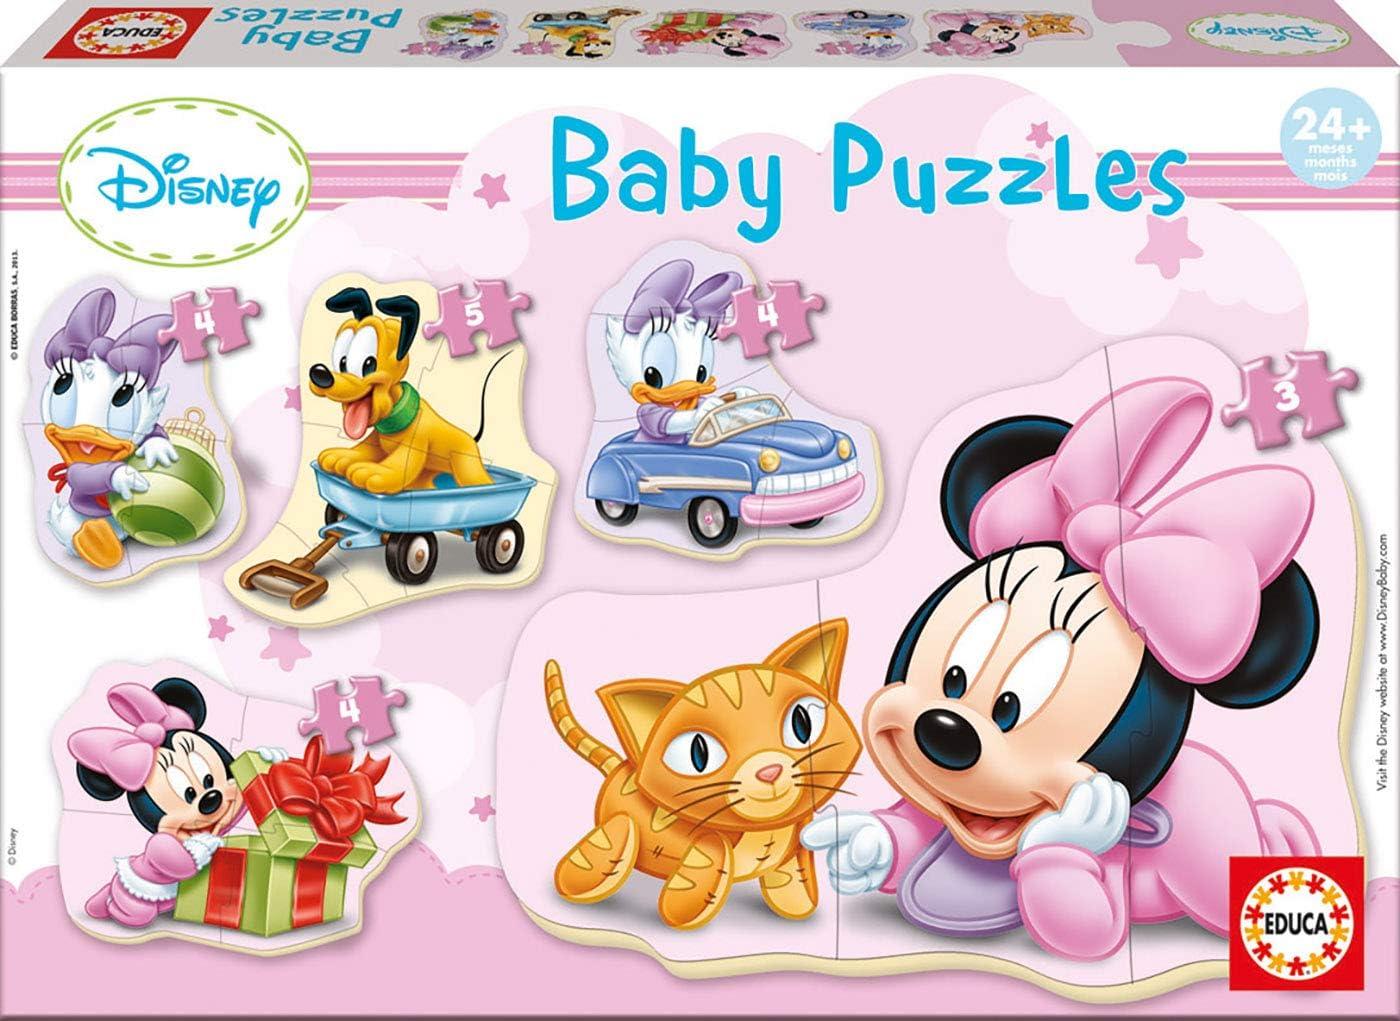 Educa - Baby Puzzles, puzzle infantil Baby Minnie, 5 puzzles progresivos de 3 a 5 piezas, a partir de 24 meses (15612)